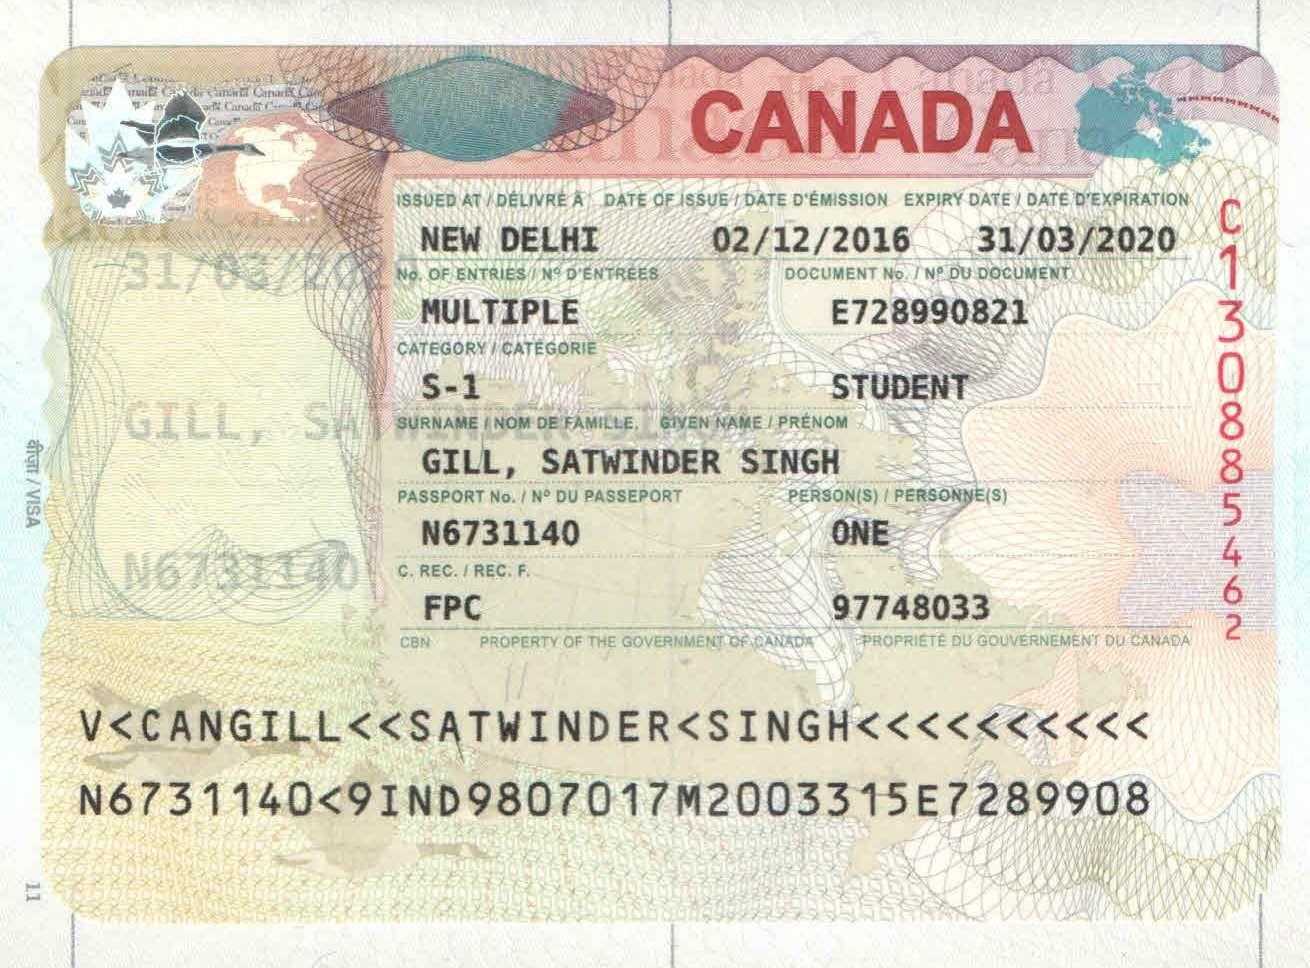 Congratulations to satwinder singh for canada visa